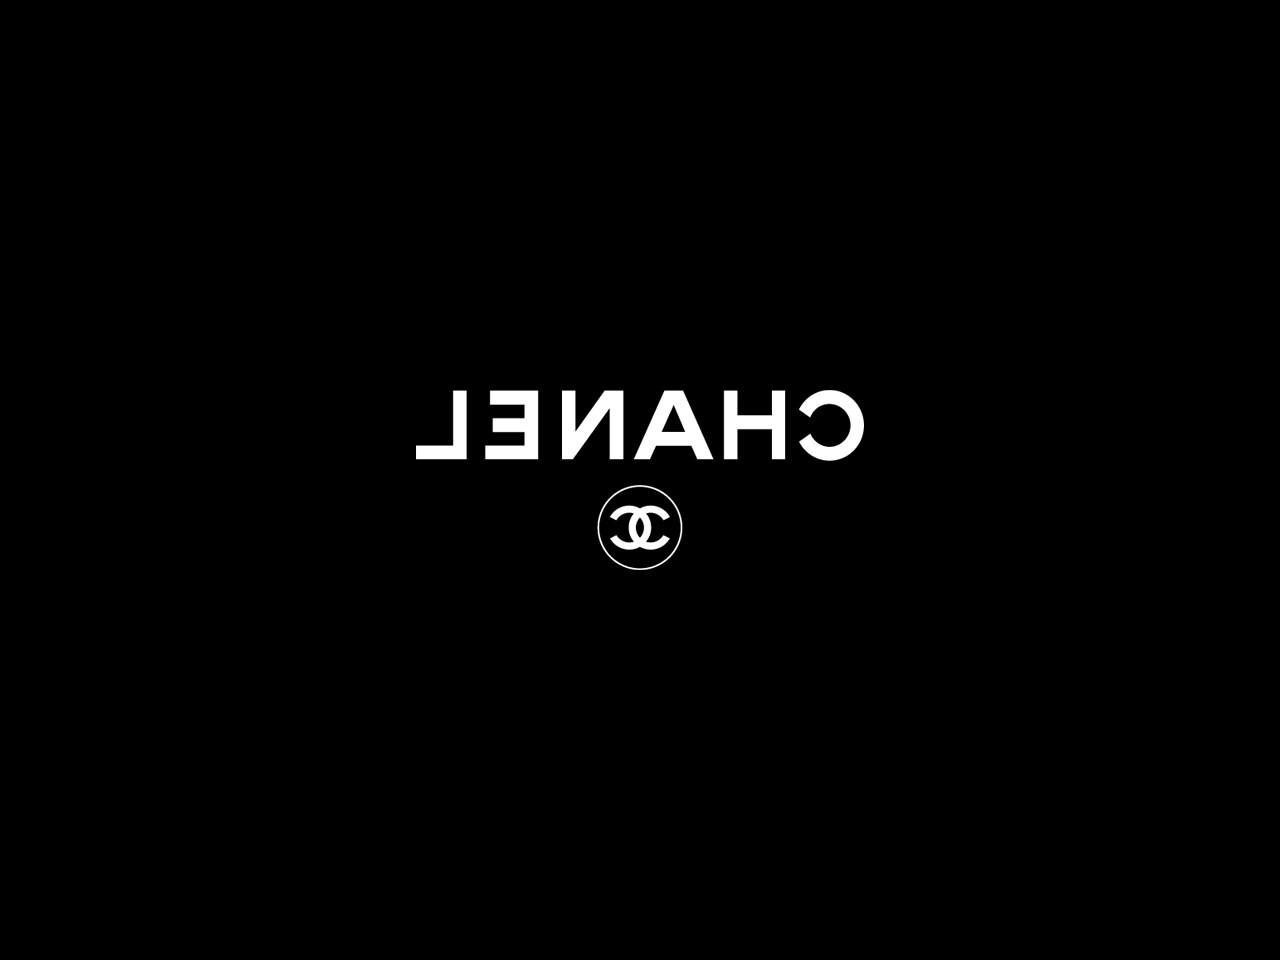 Chanel Logo Wallpaper Black Chanel logo wallpaper iphone 1280x960